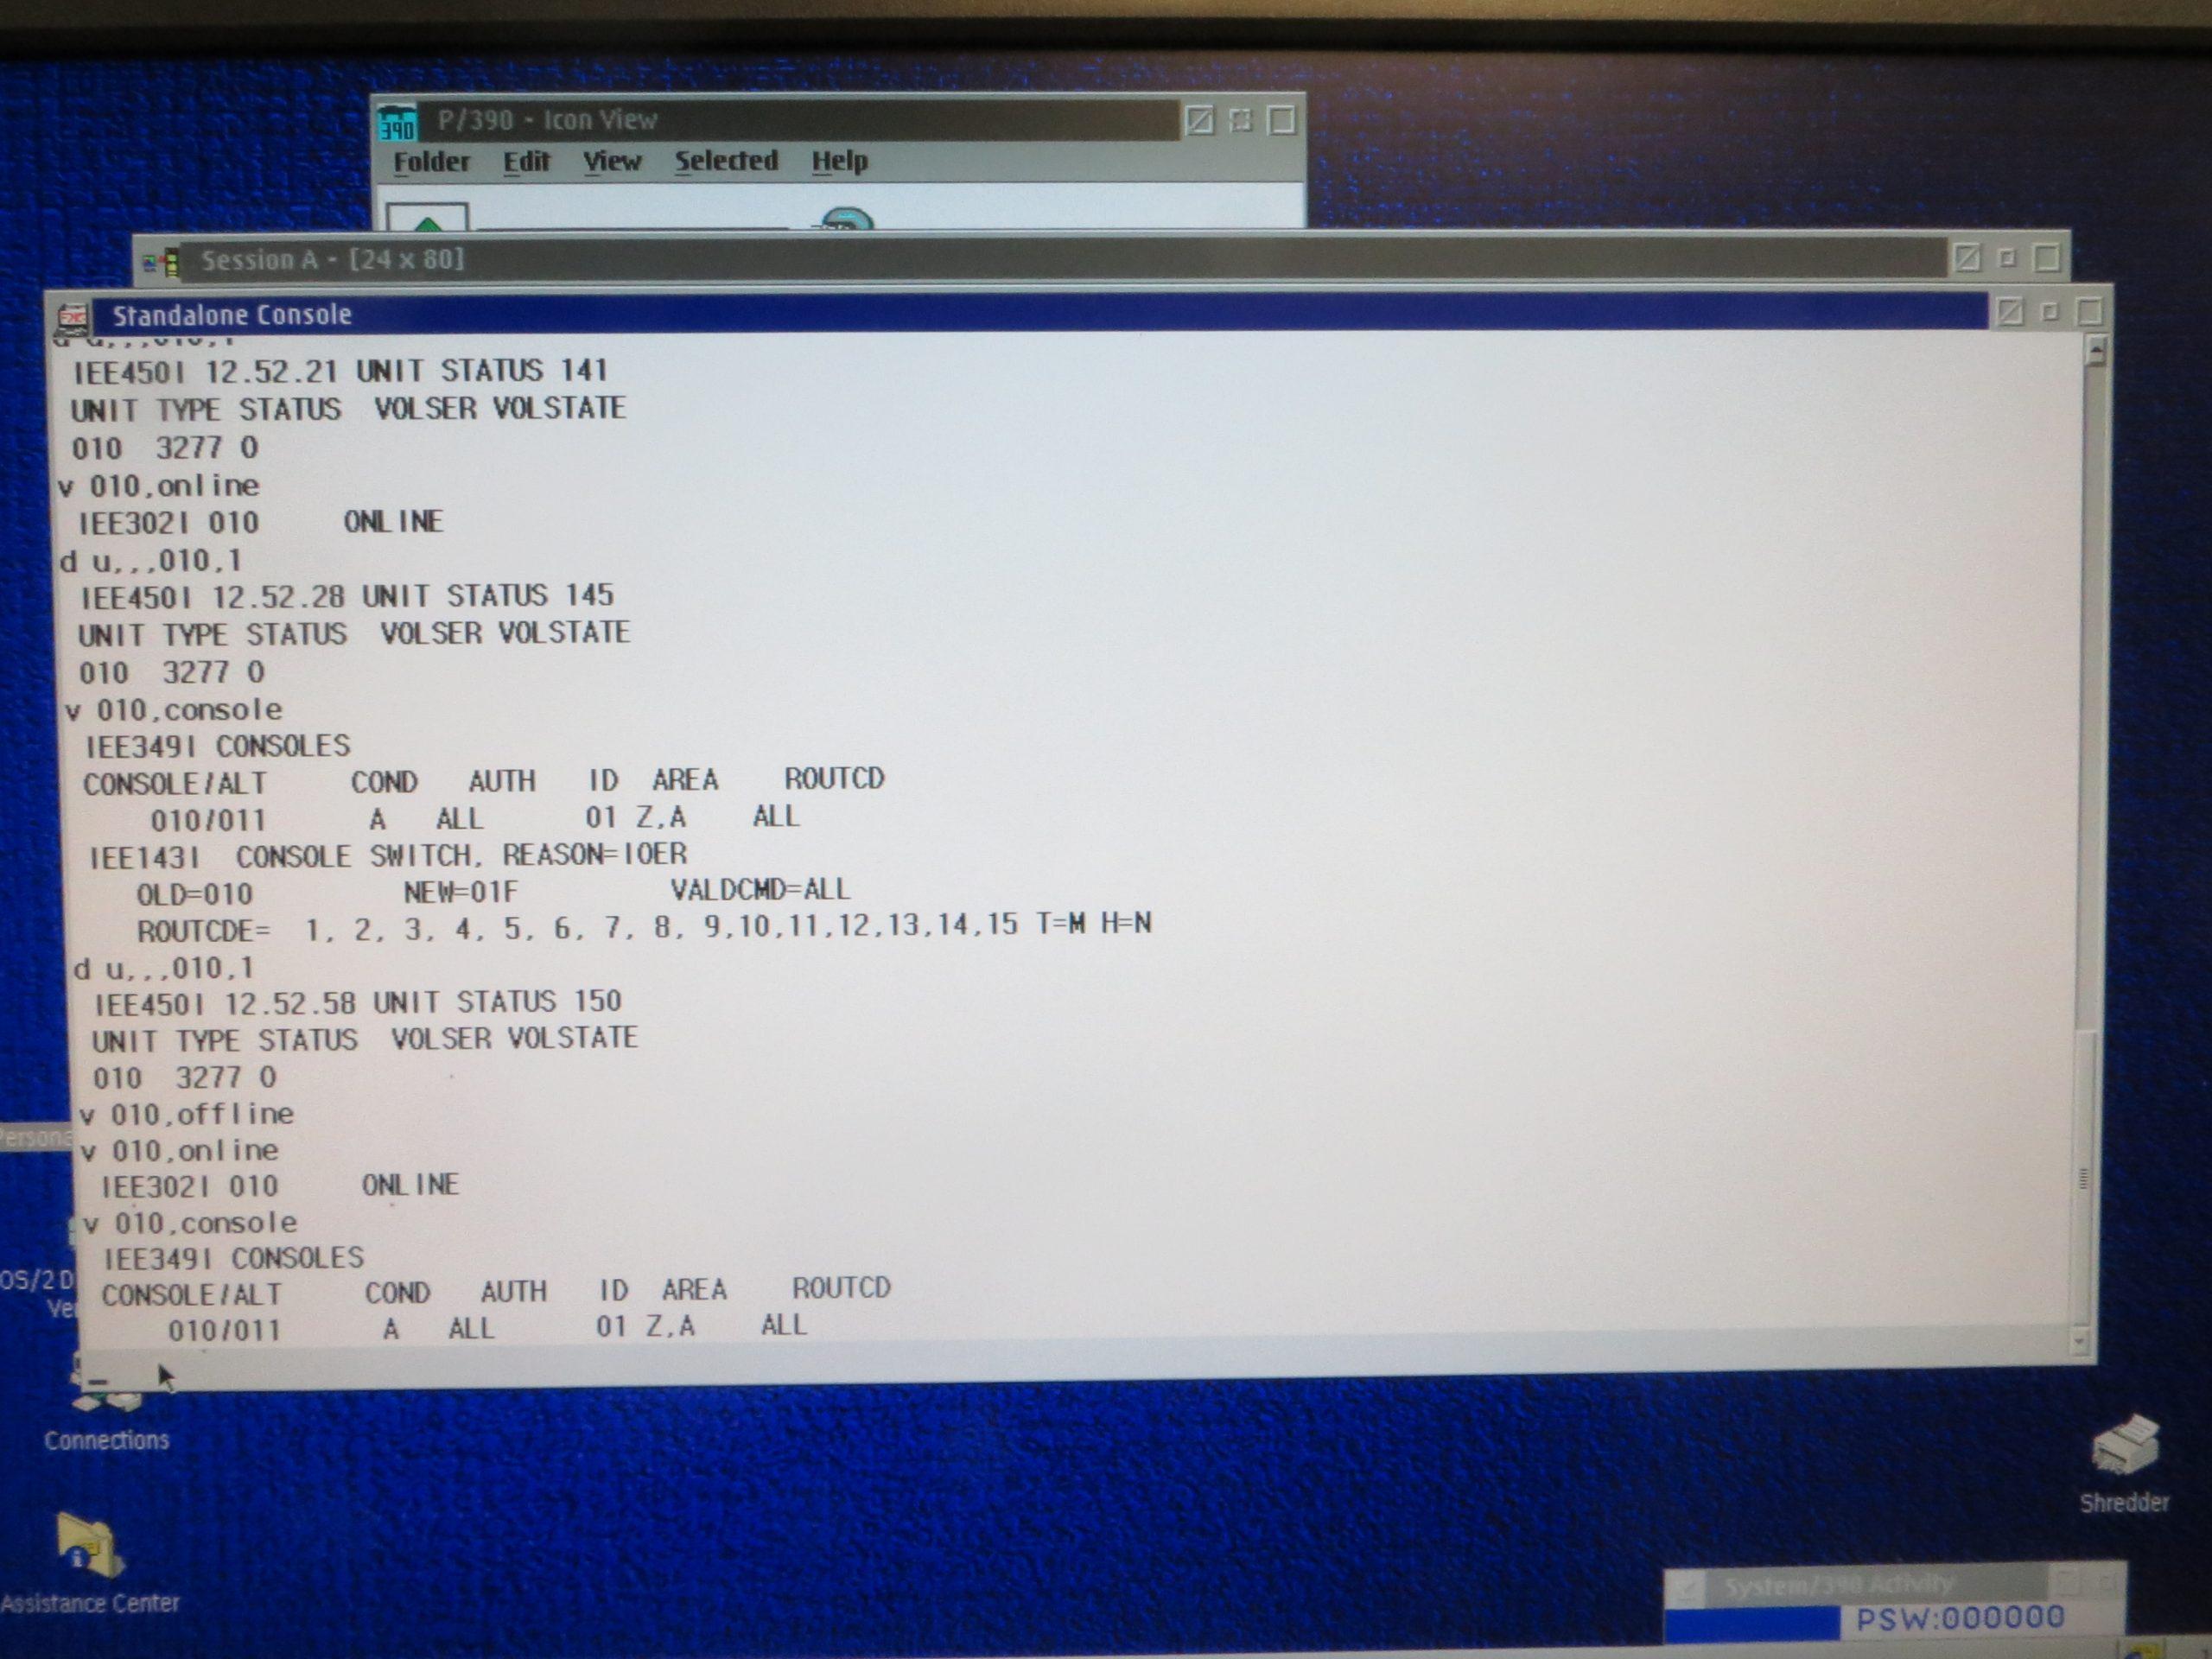 AMD 1.33 GHz Athlon PC P/390E MVS 3.8j Switch to 3270 Console